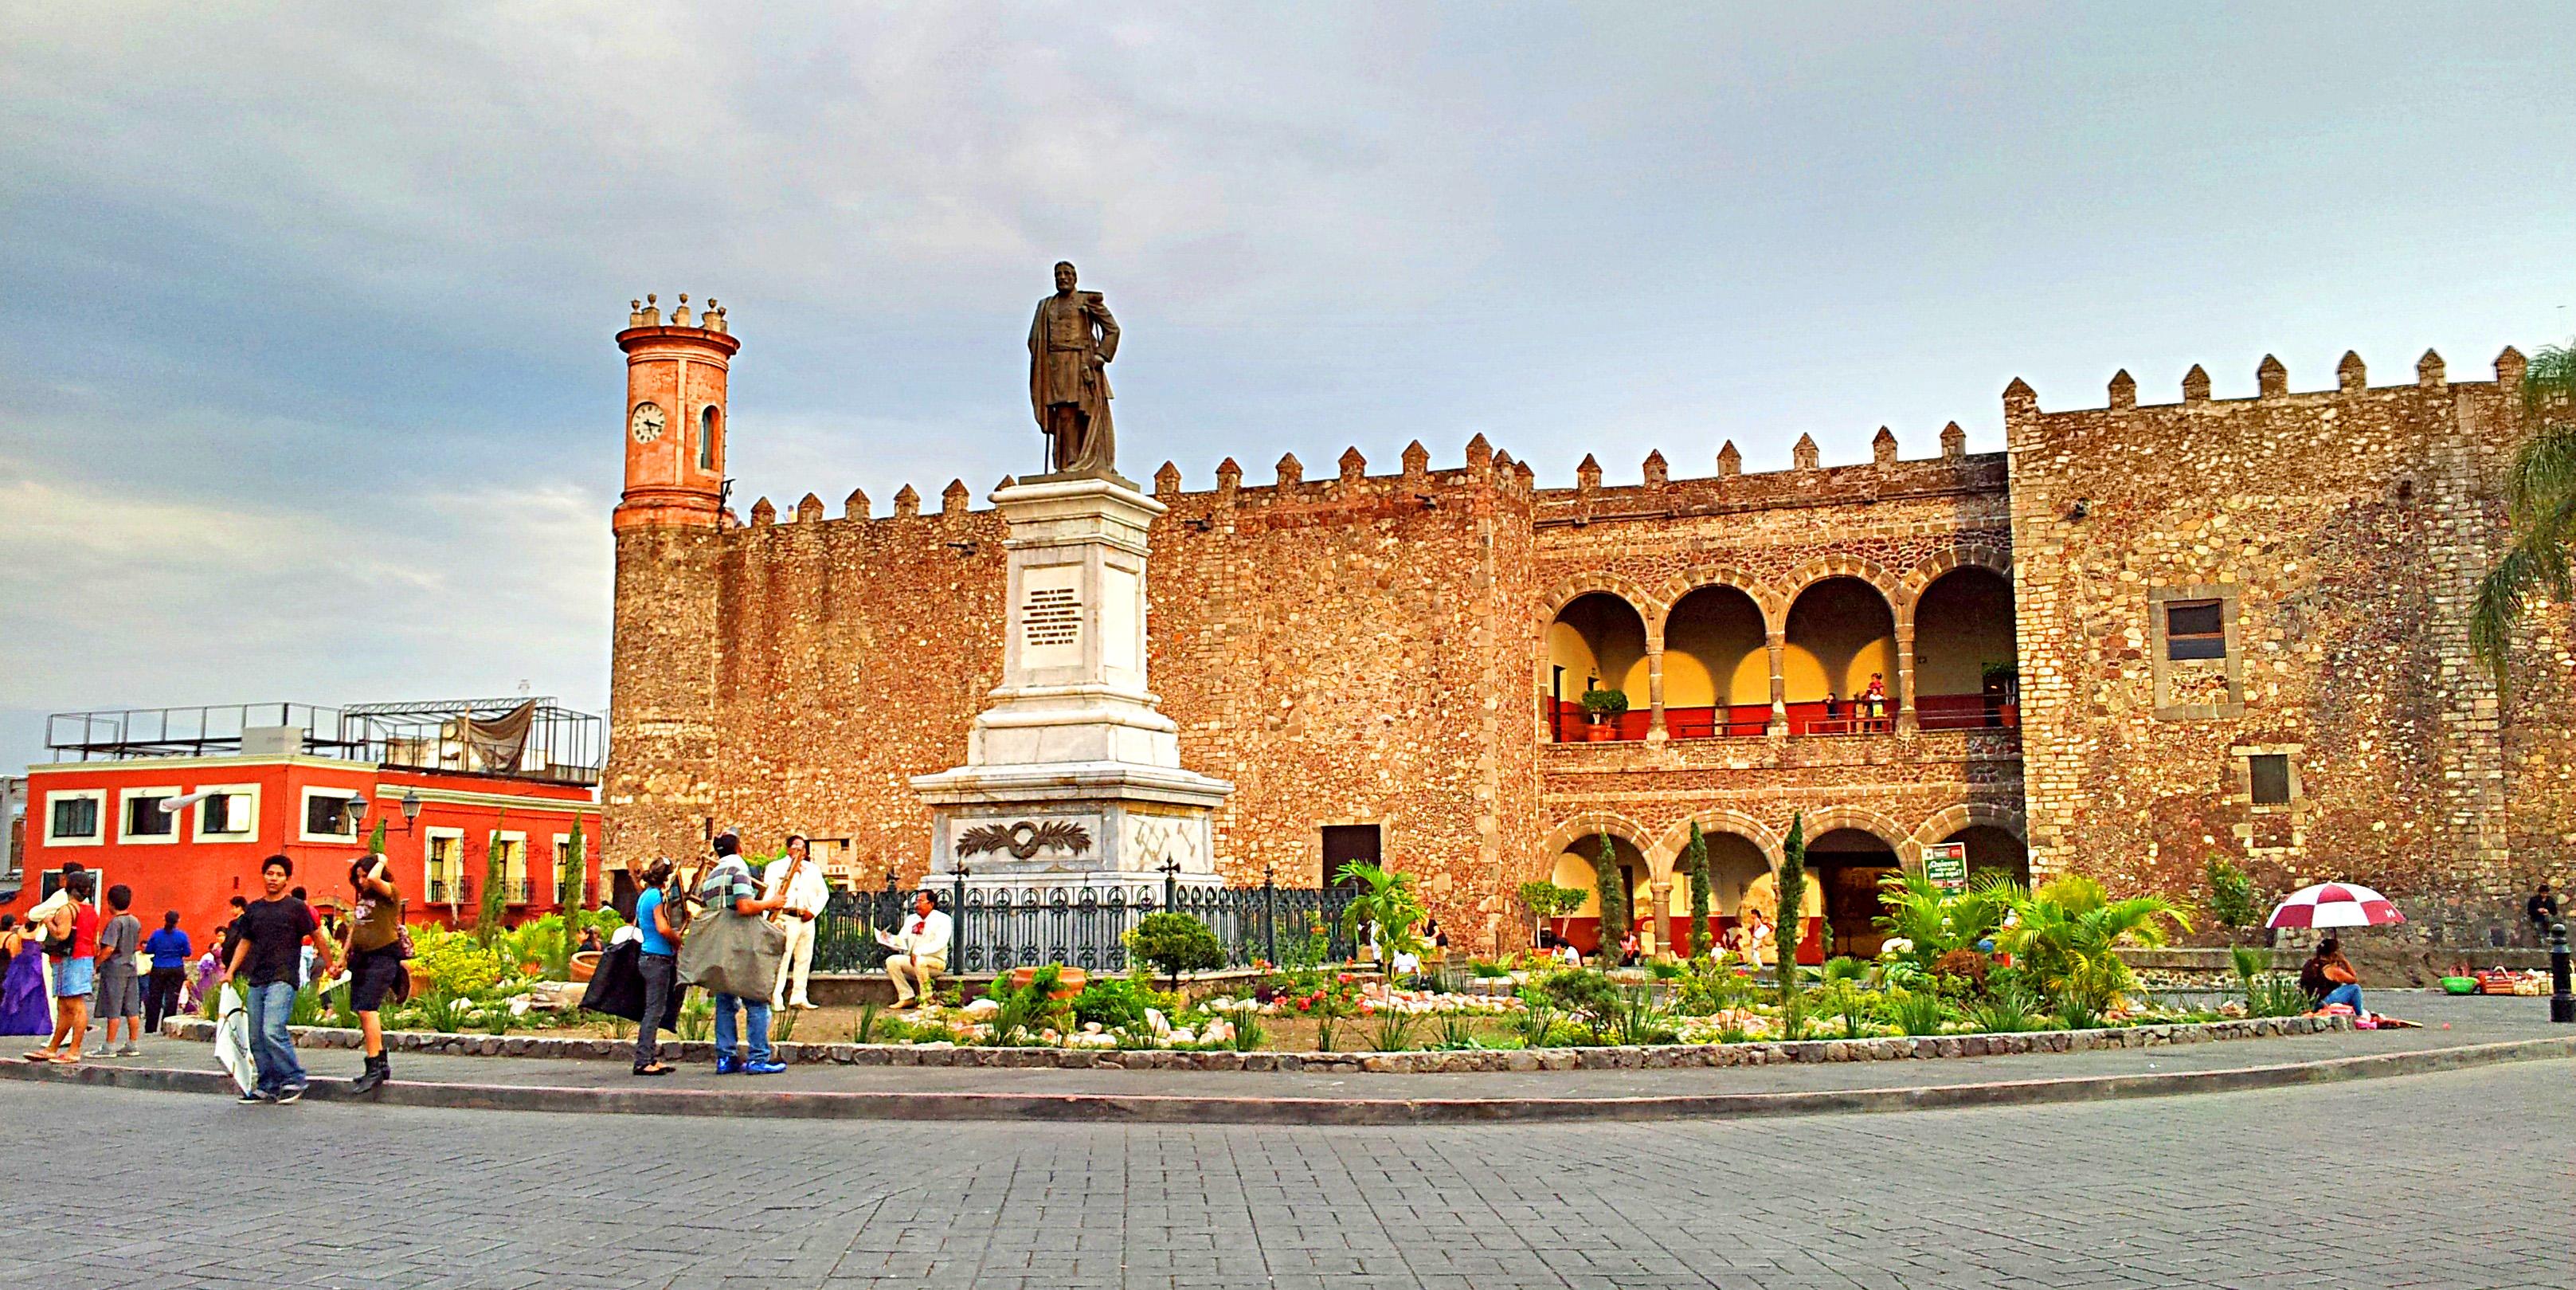 http://upload.wikimedia.org/wikipedia/commons/a/a9/Cuernavaca-cortez.jpg